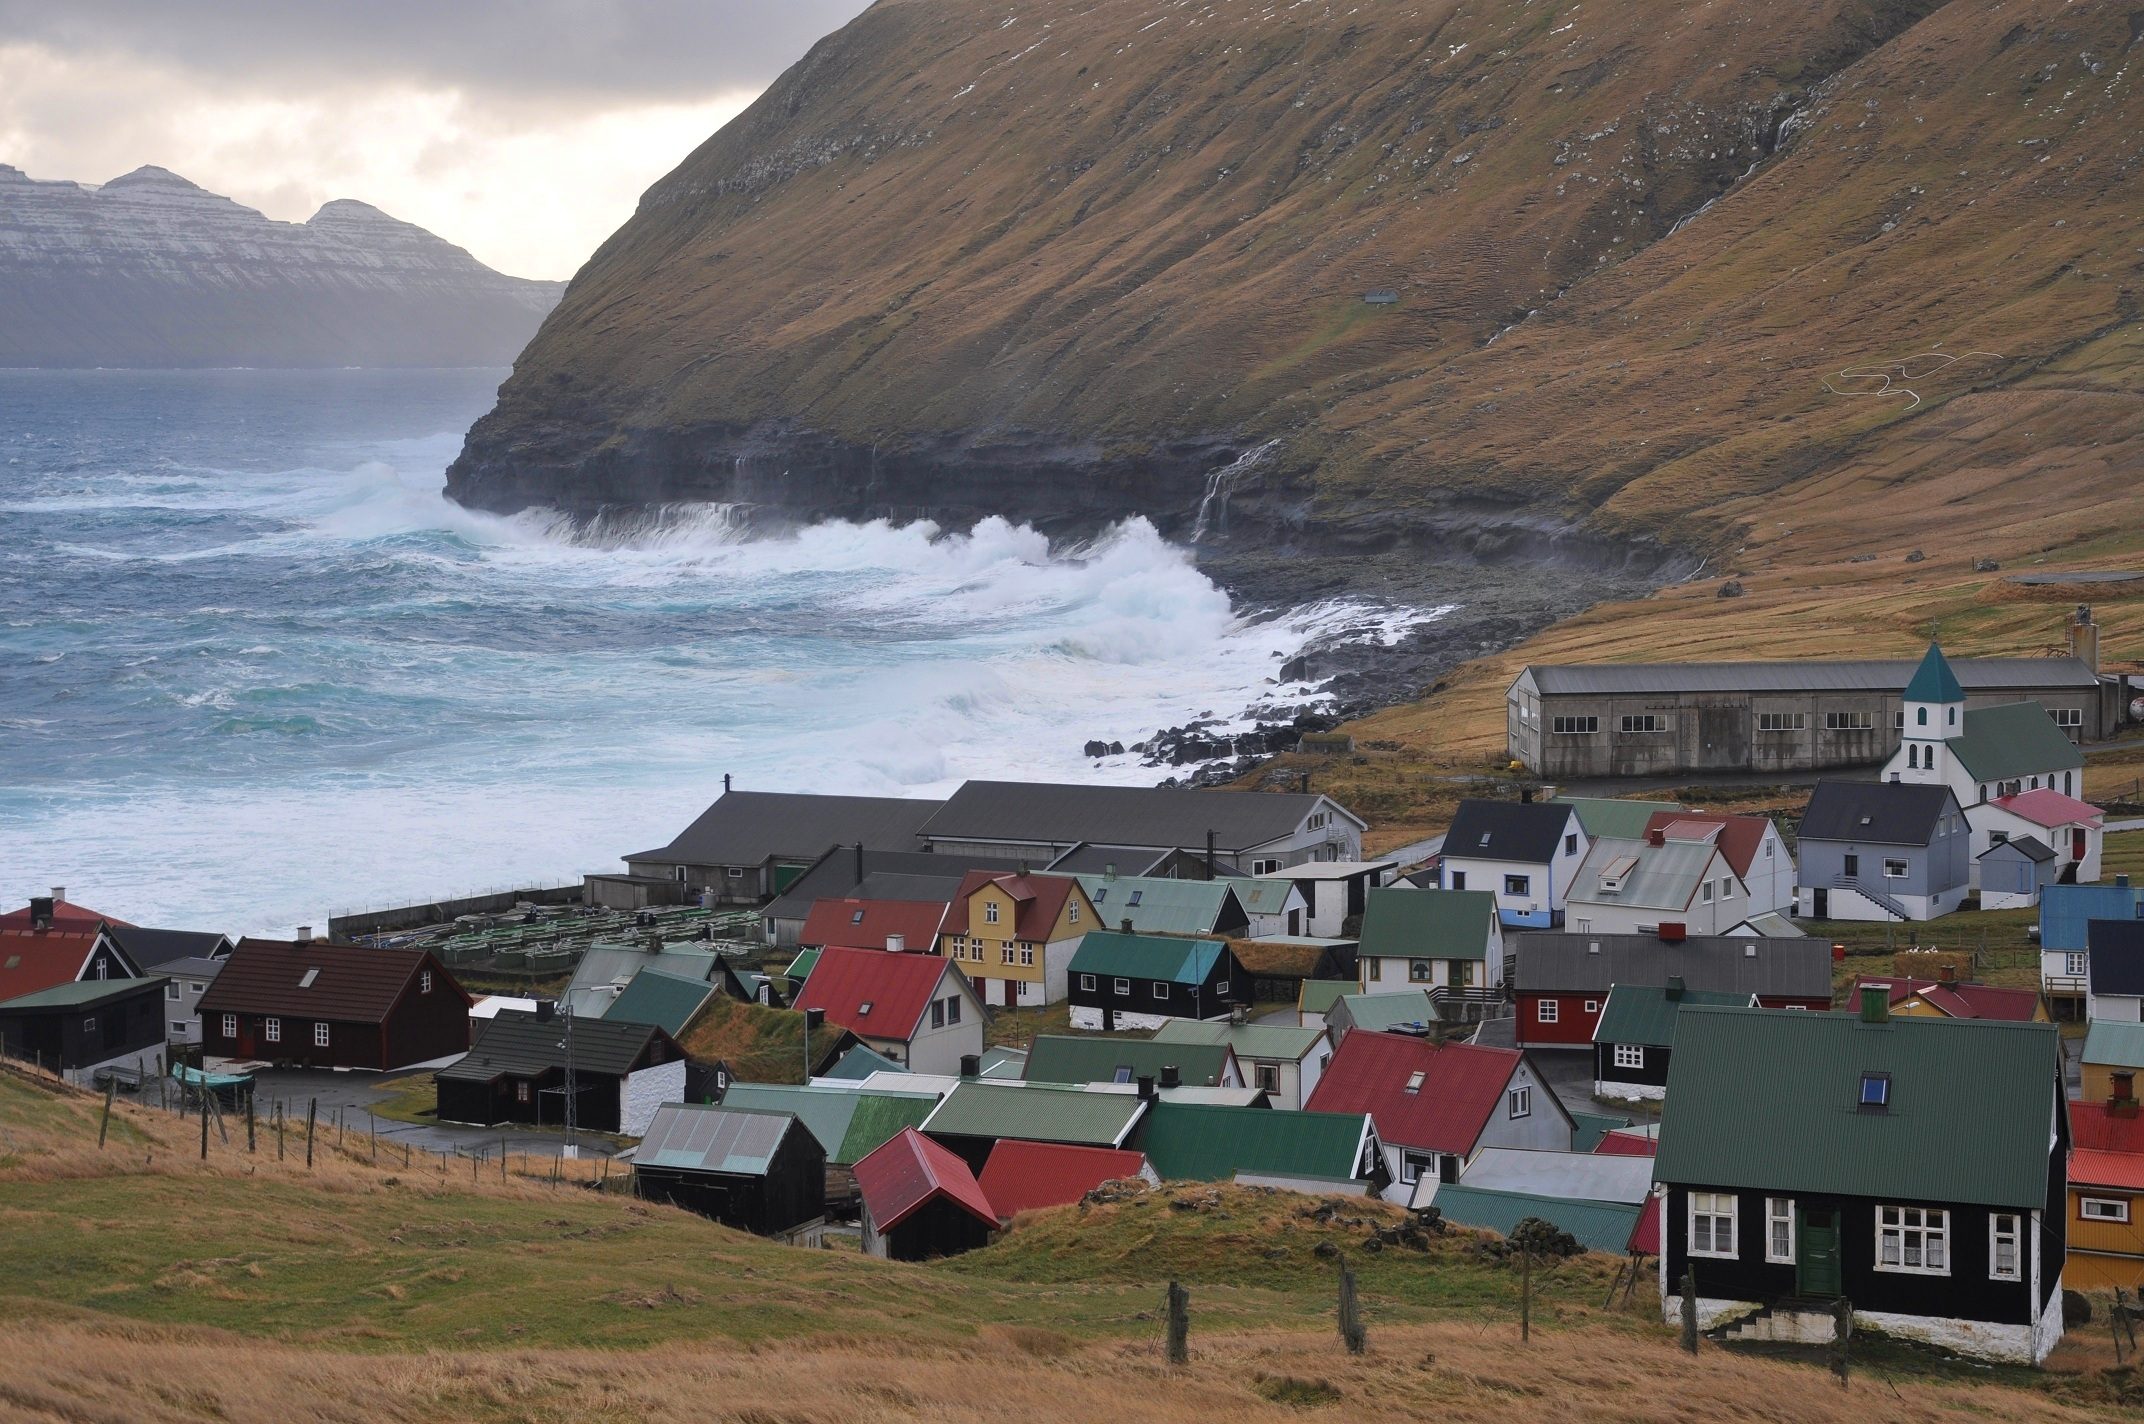 Choppy seas and heavy surf at Gjógv (Eysturoy, Faroe Islands, Denmark). Photo taken on October 22, 2010.